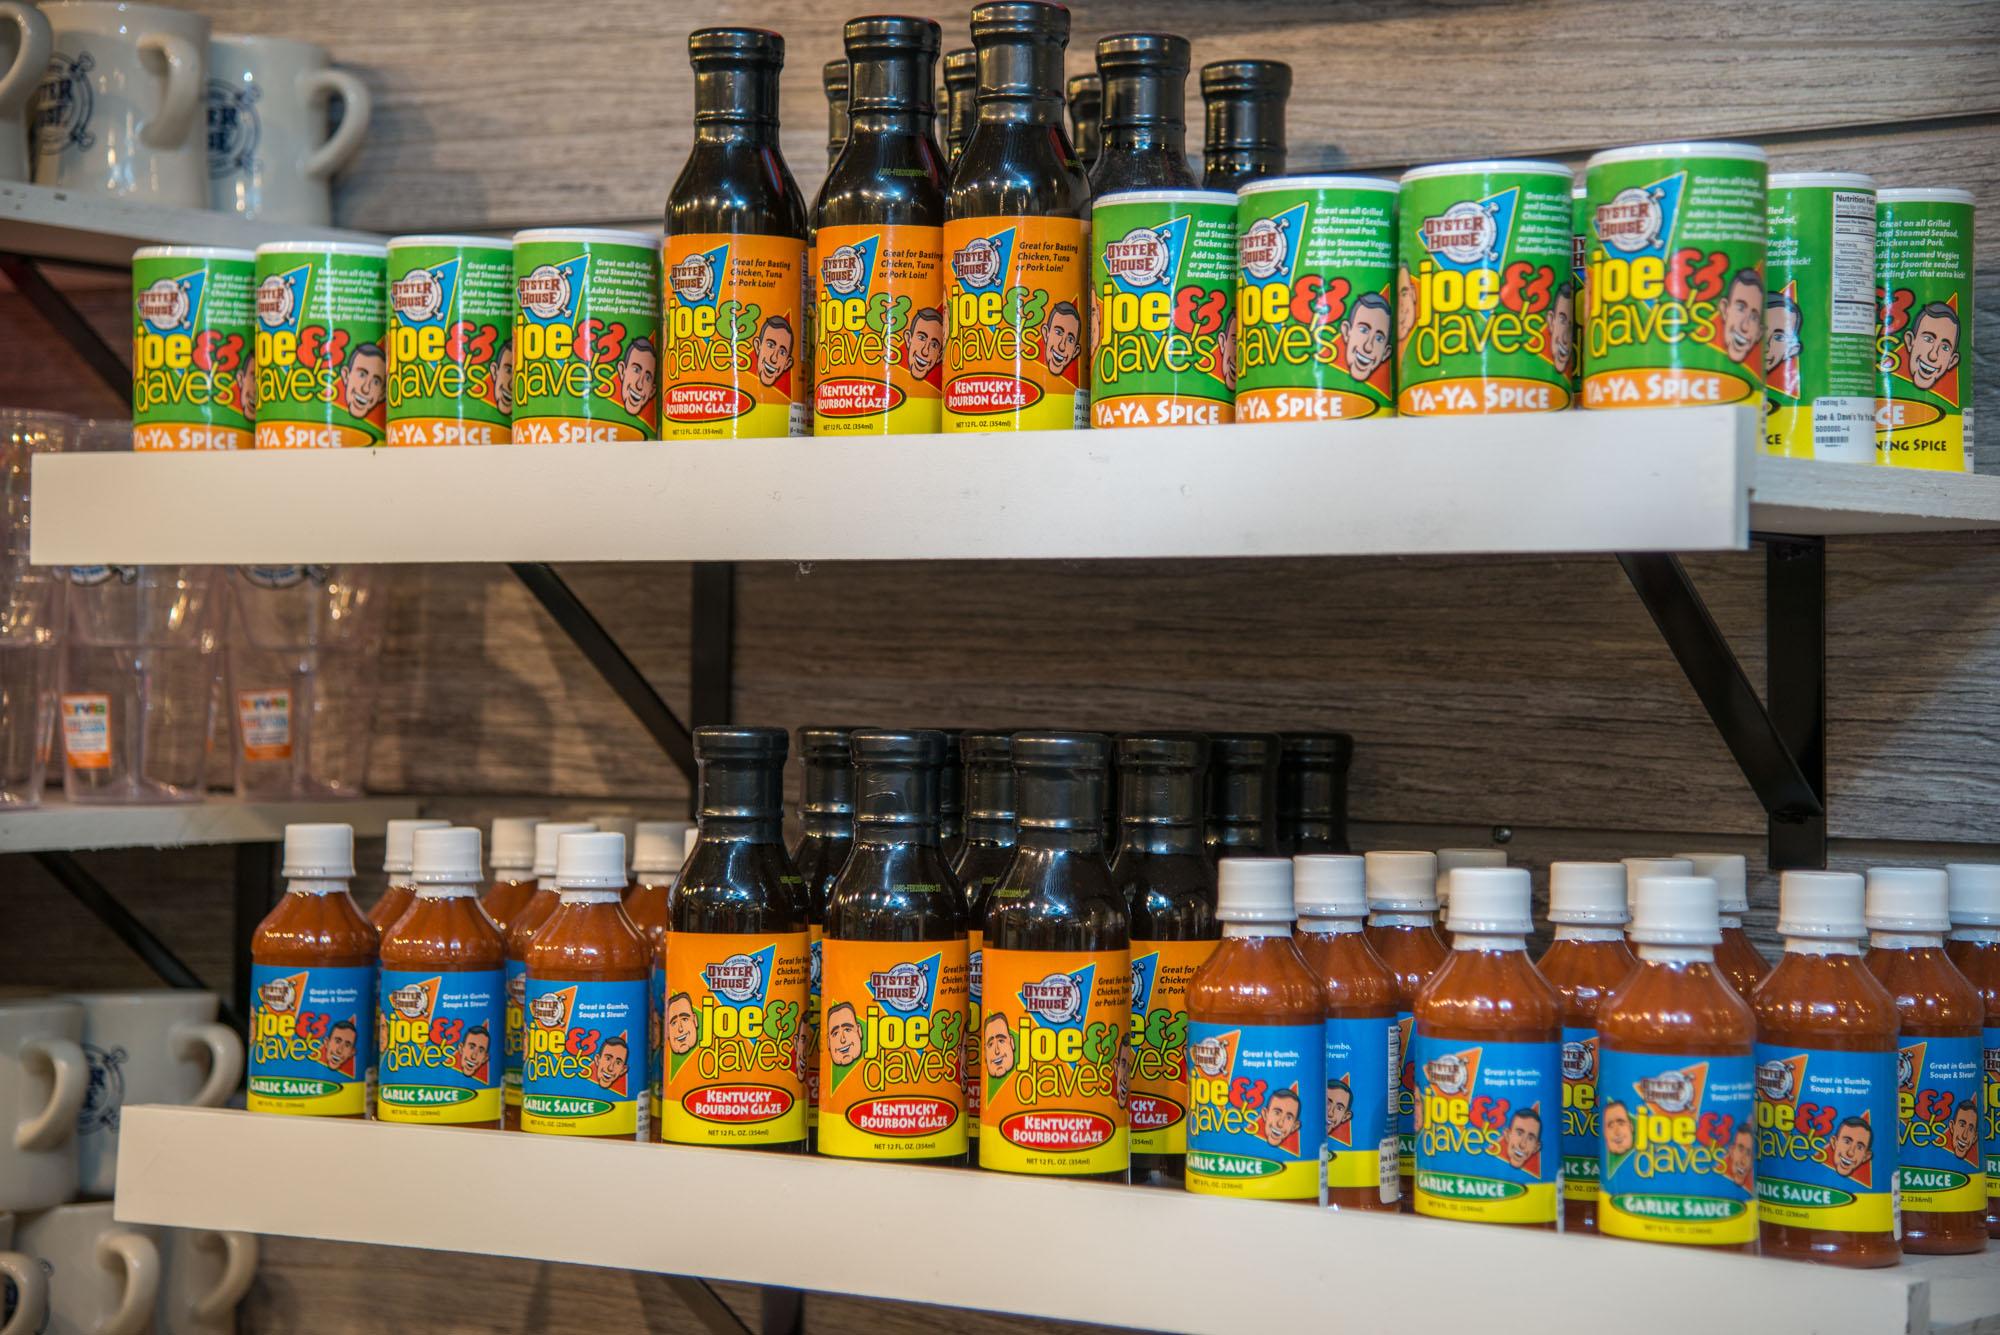 Joe & dave's Products